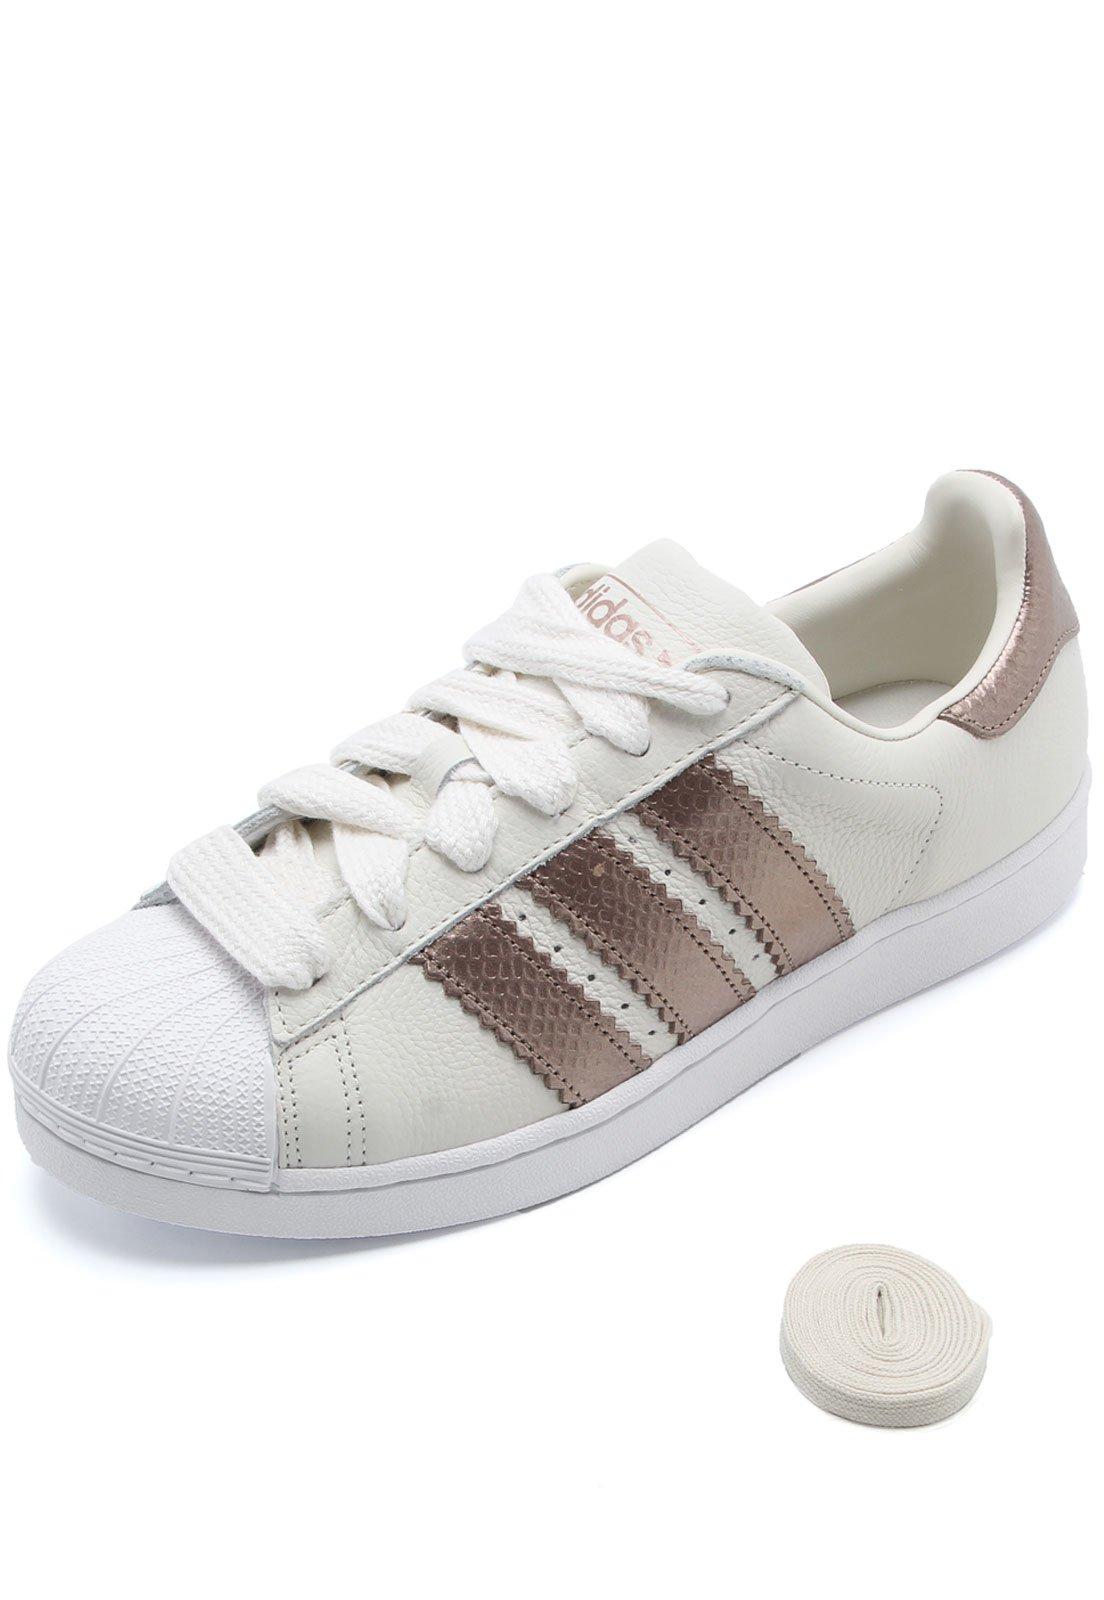 Tênis adidas Originals Superstar W Off White